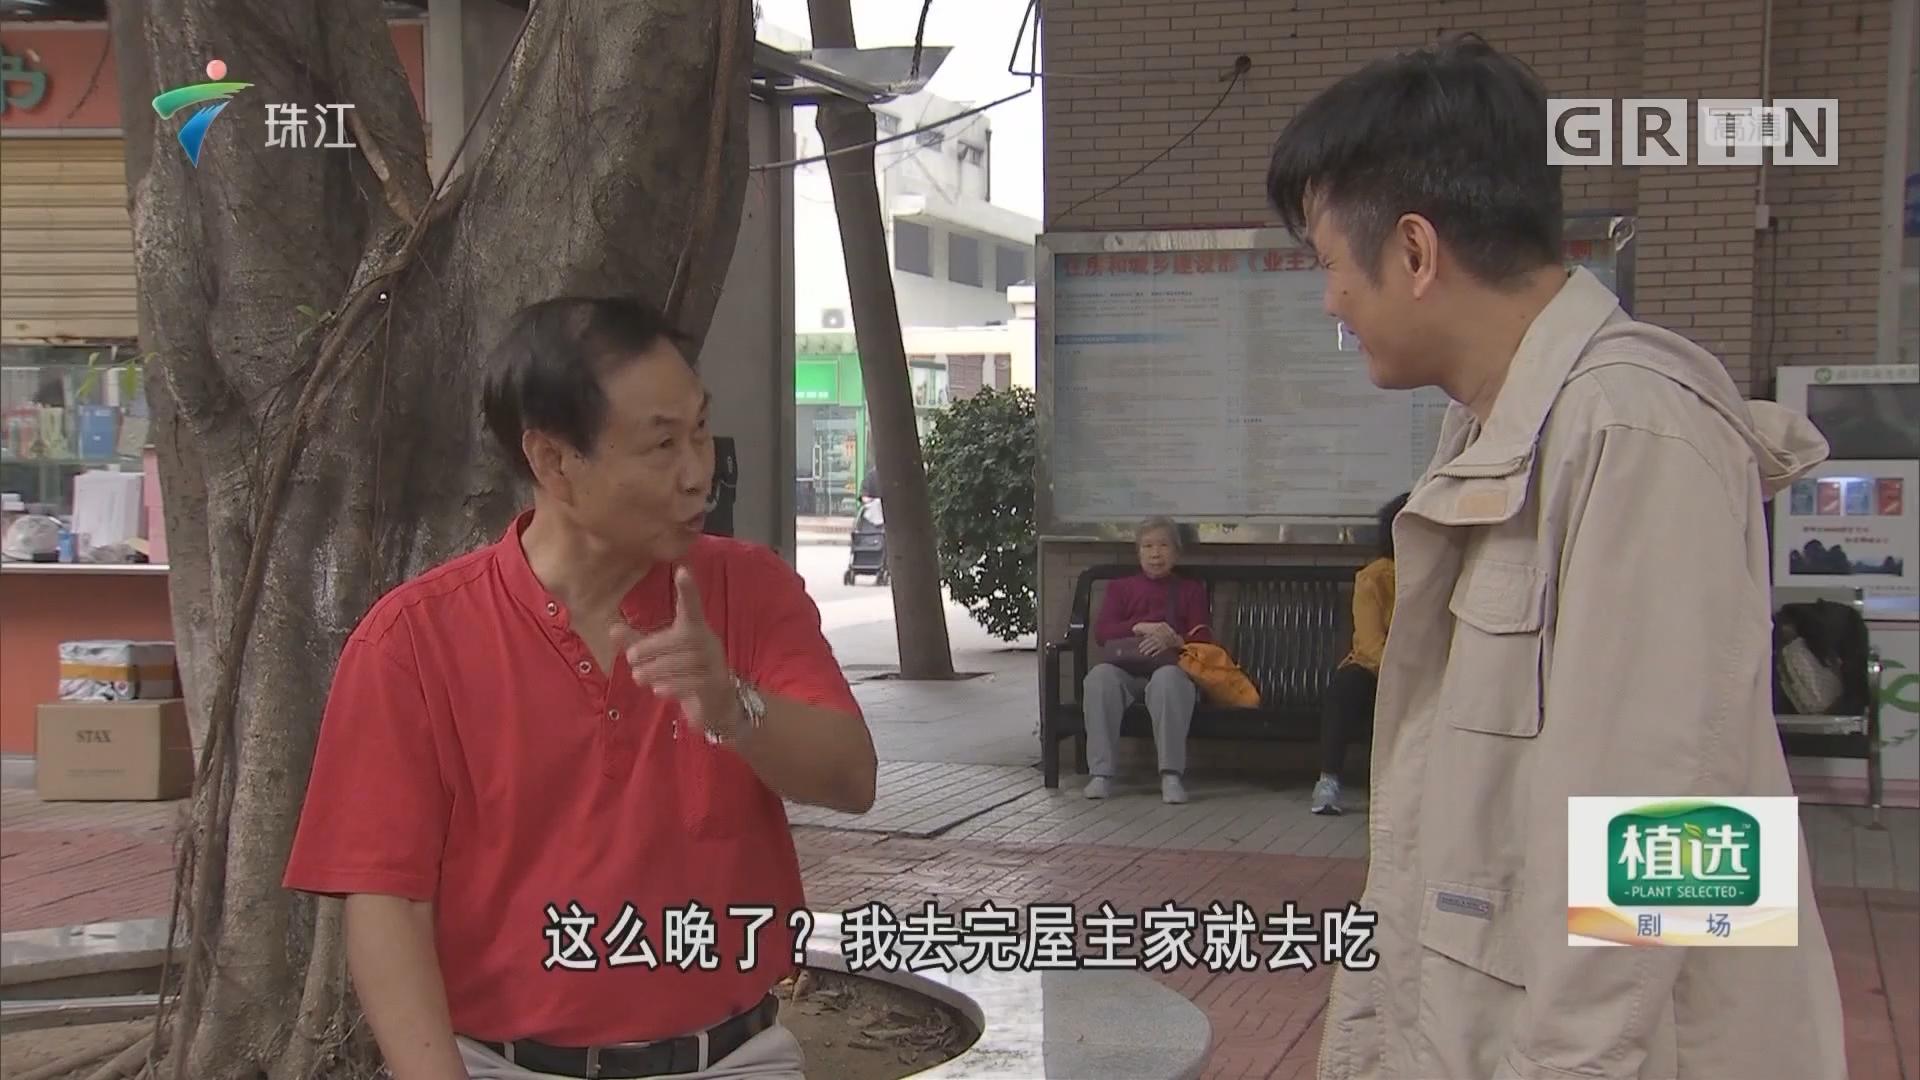 [HD][2018-11-18]外来媳妇本地郎:一台旧电视(上)